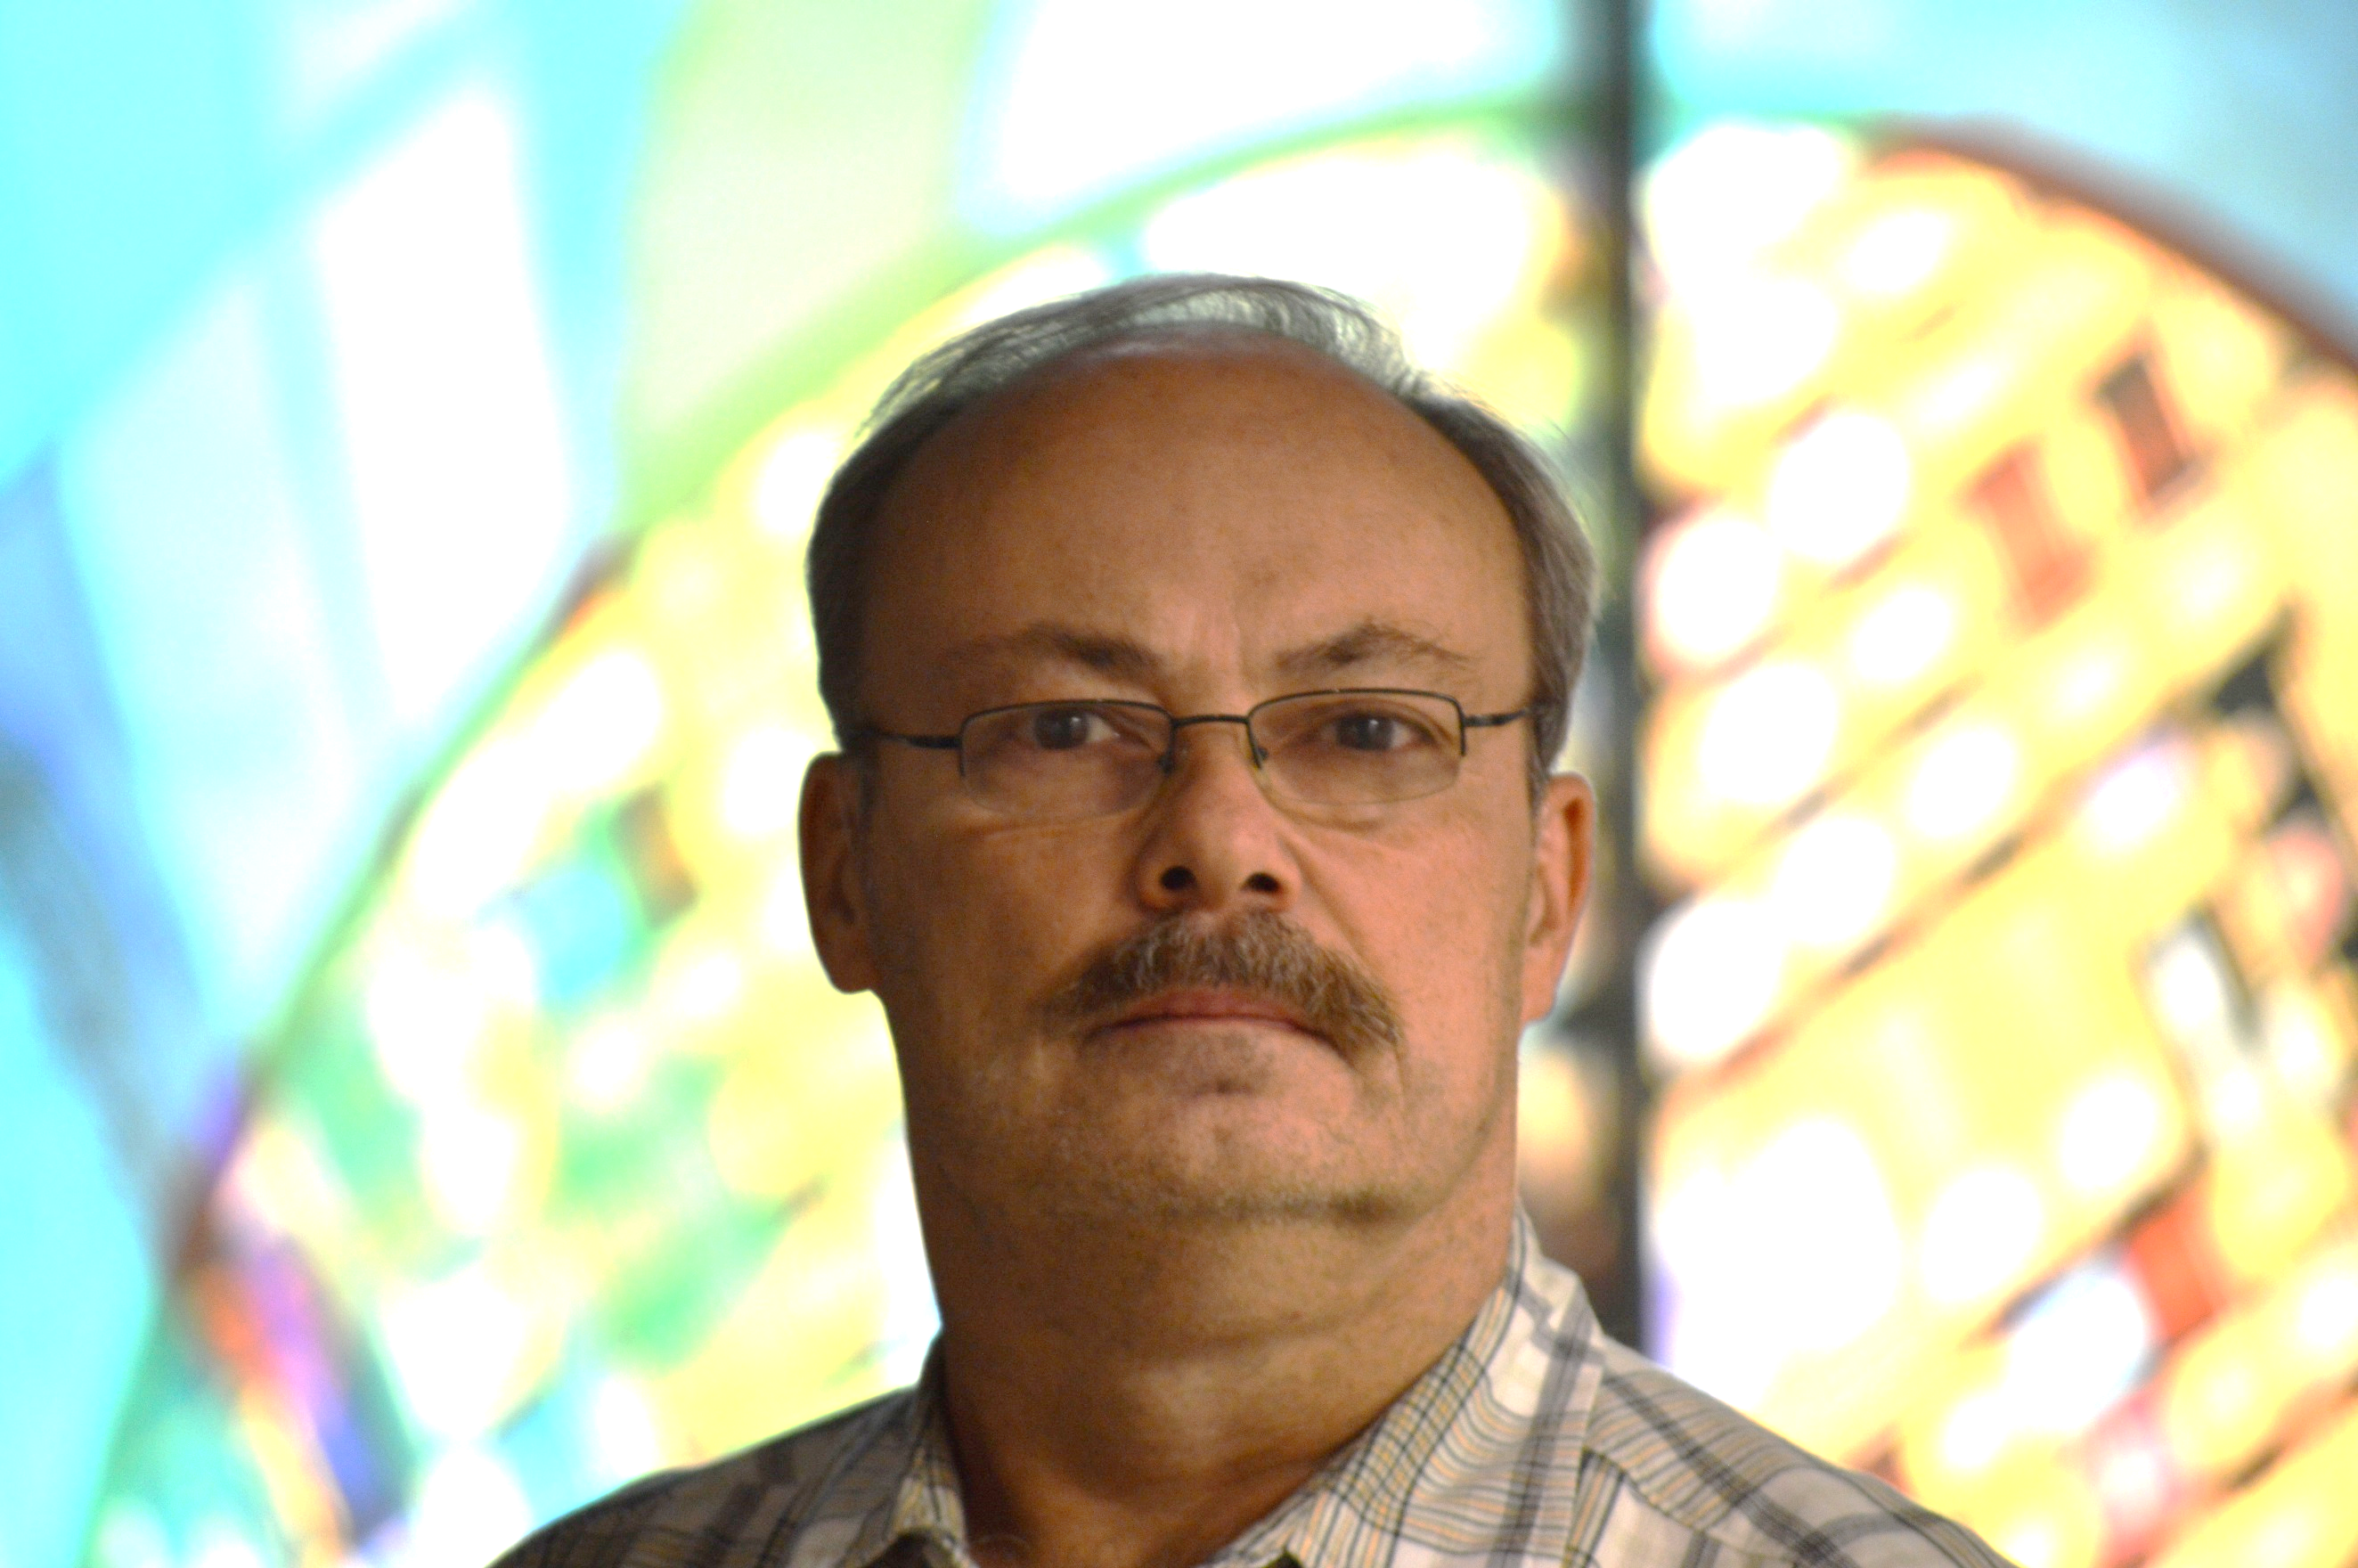 Albert Fosmoe